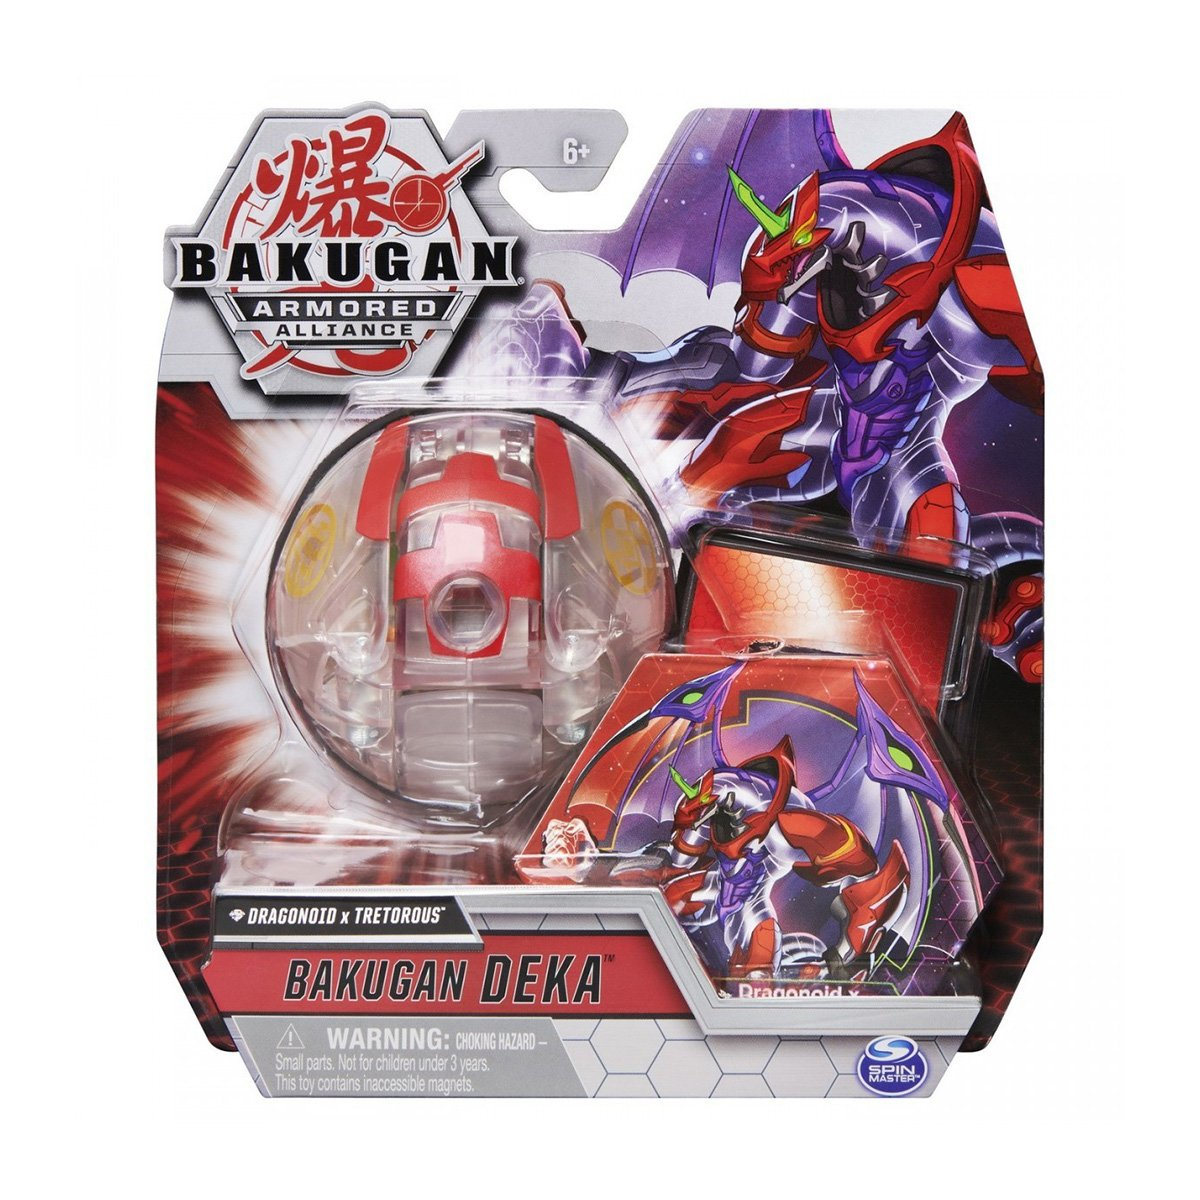 Figurina Bakugan Deka Armored Alliance, Dragonoid x Tretorous, 20126467